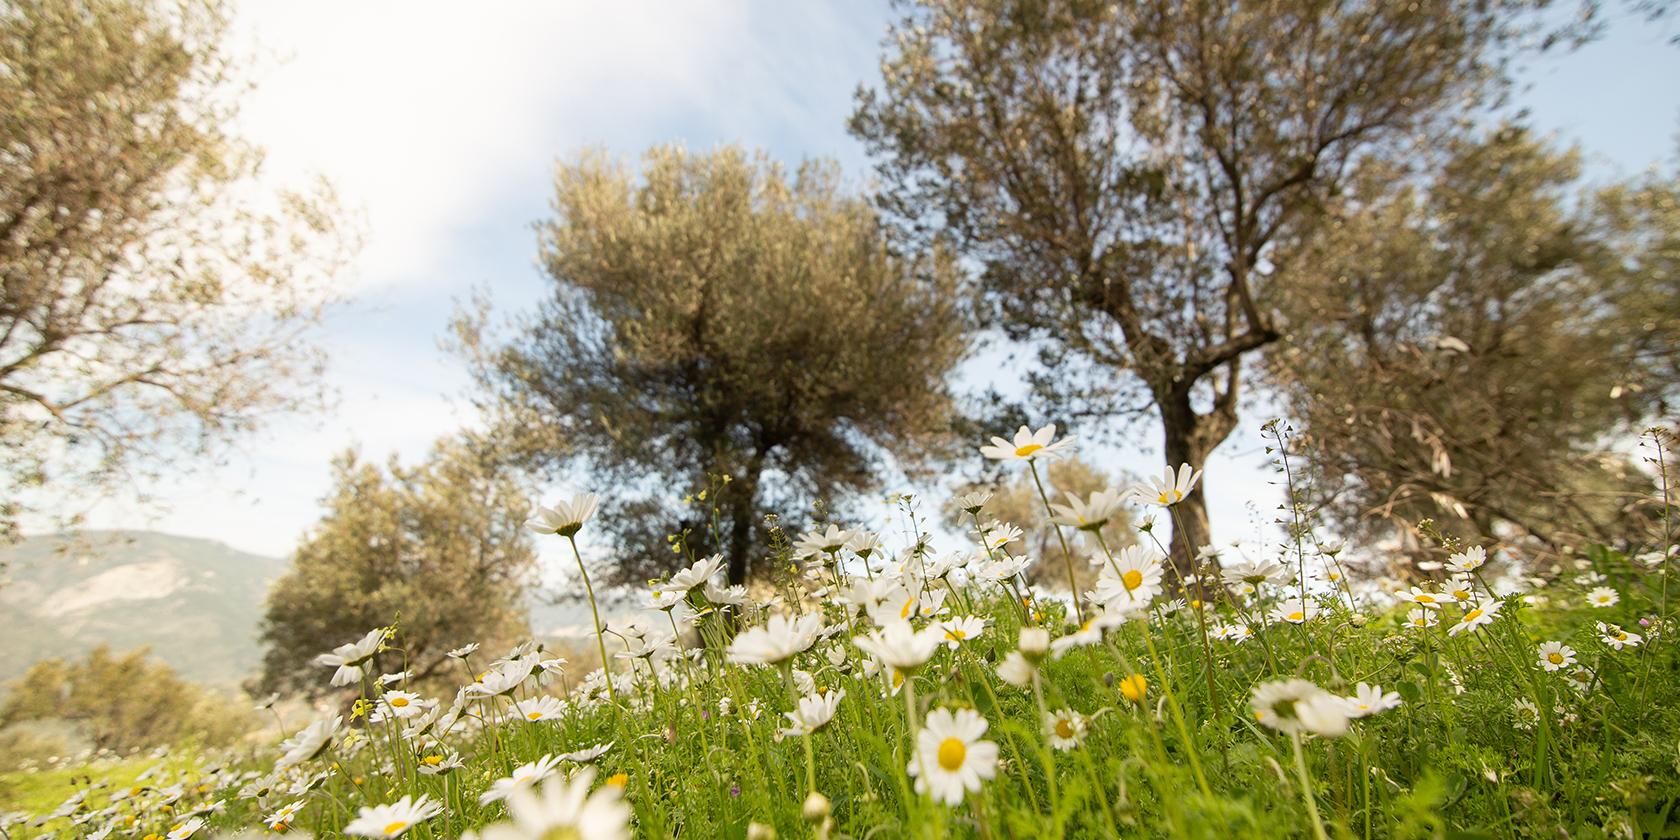 Lesvos Olive Trees